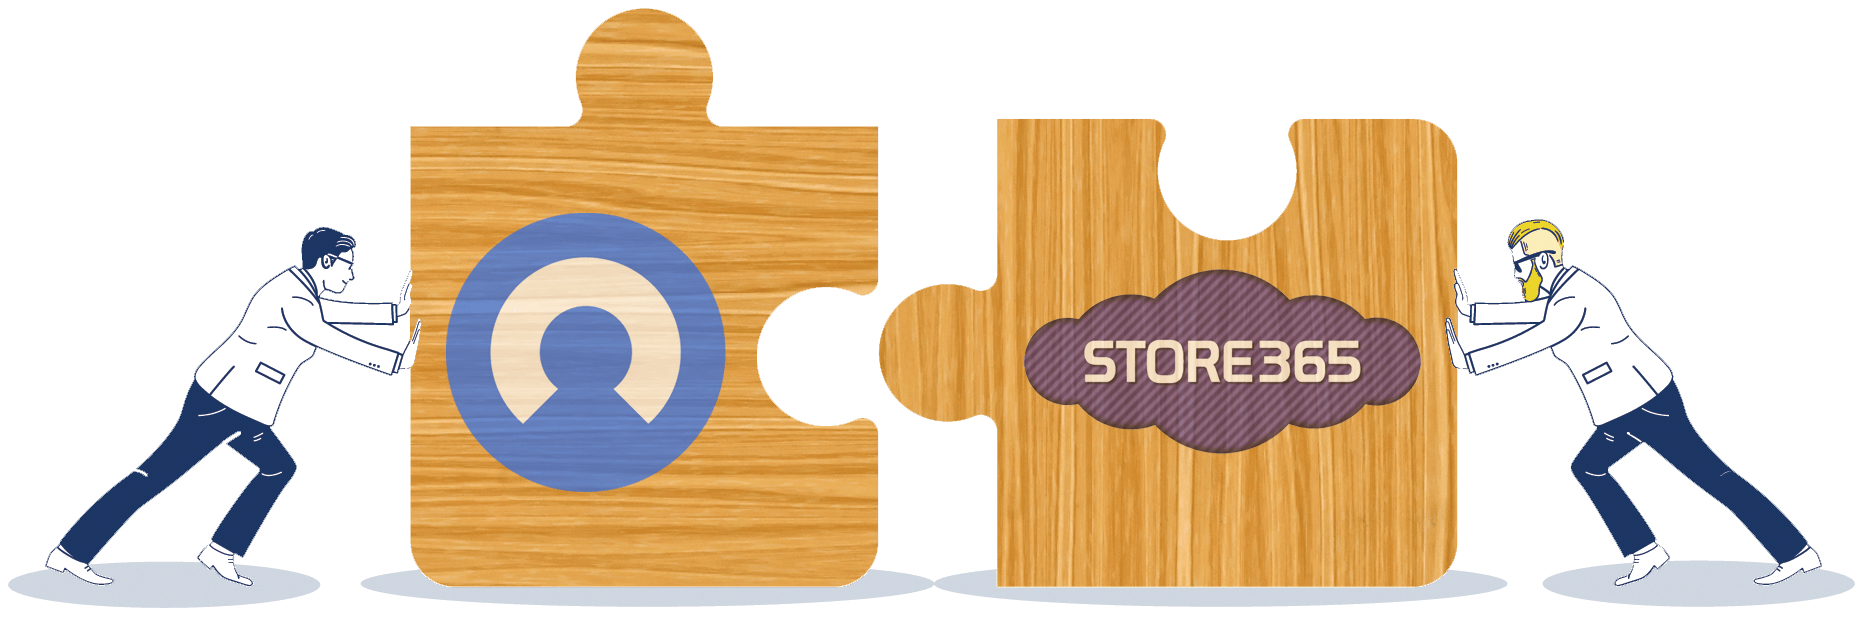 Store365 + slimme telefonie